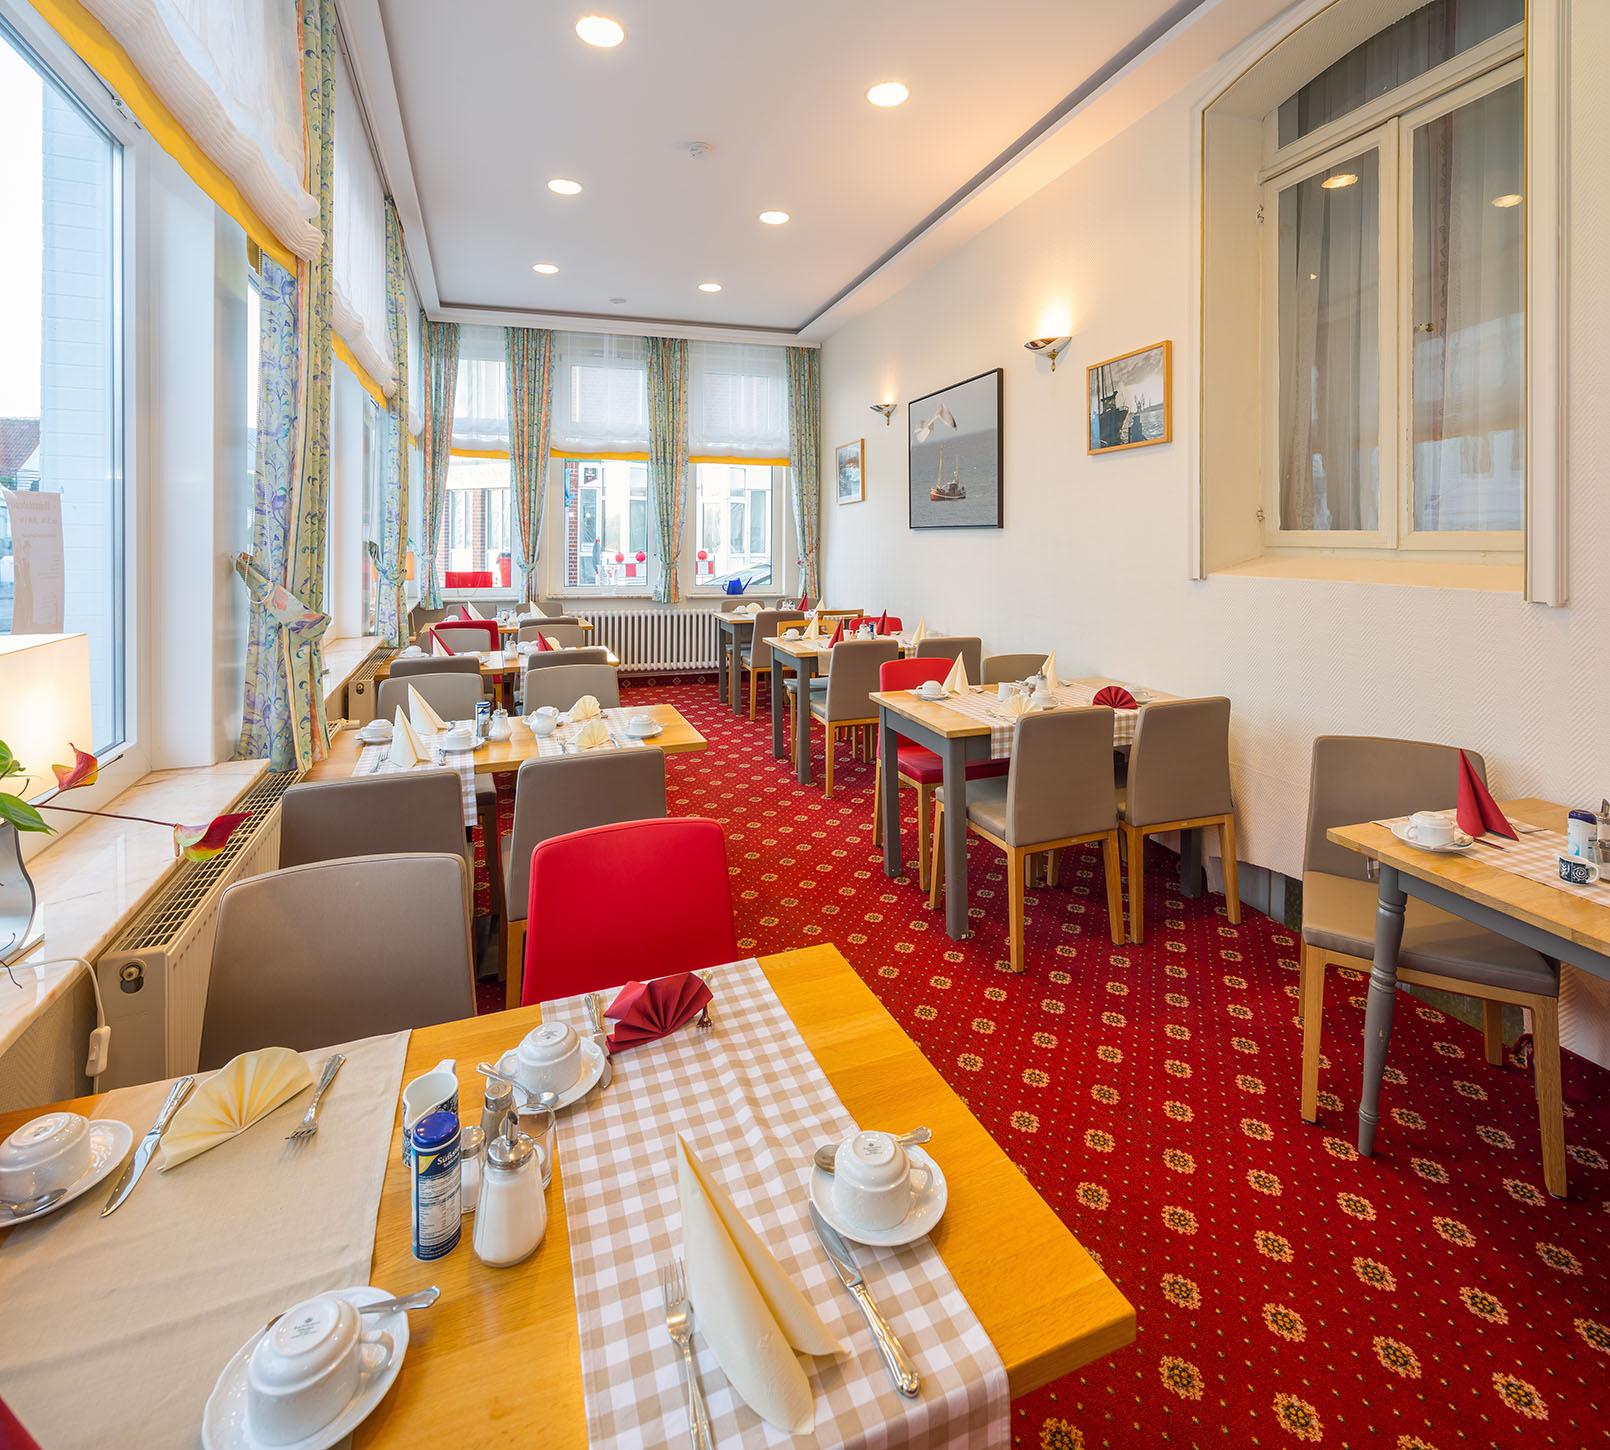 Frühstücksraum im Hotel Cornelius